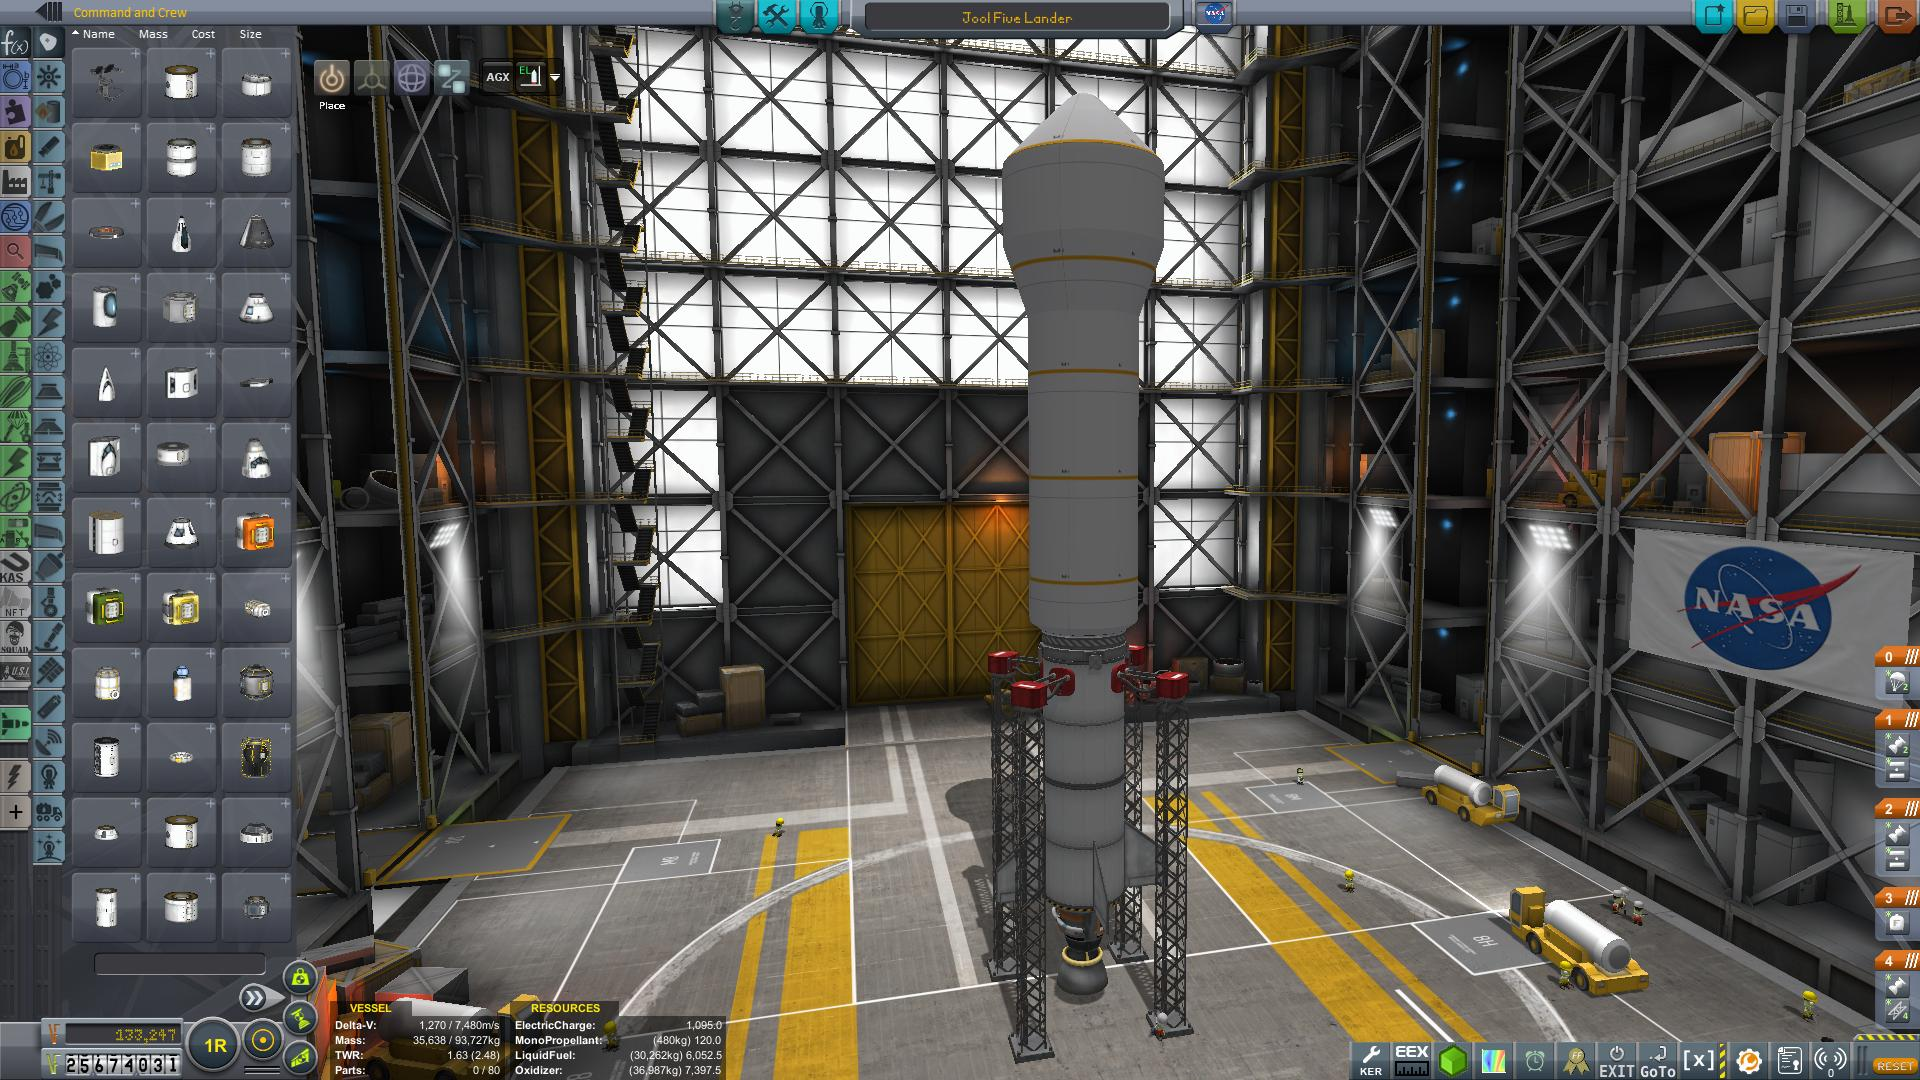 Jool 5 Lander Launcher